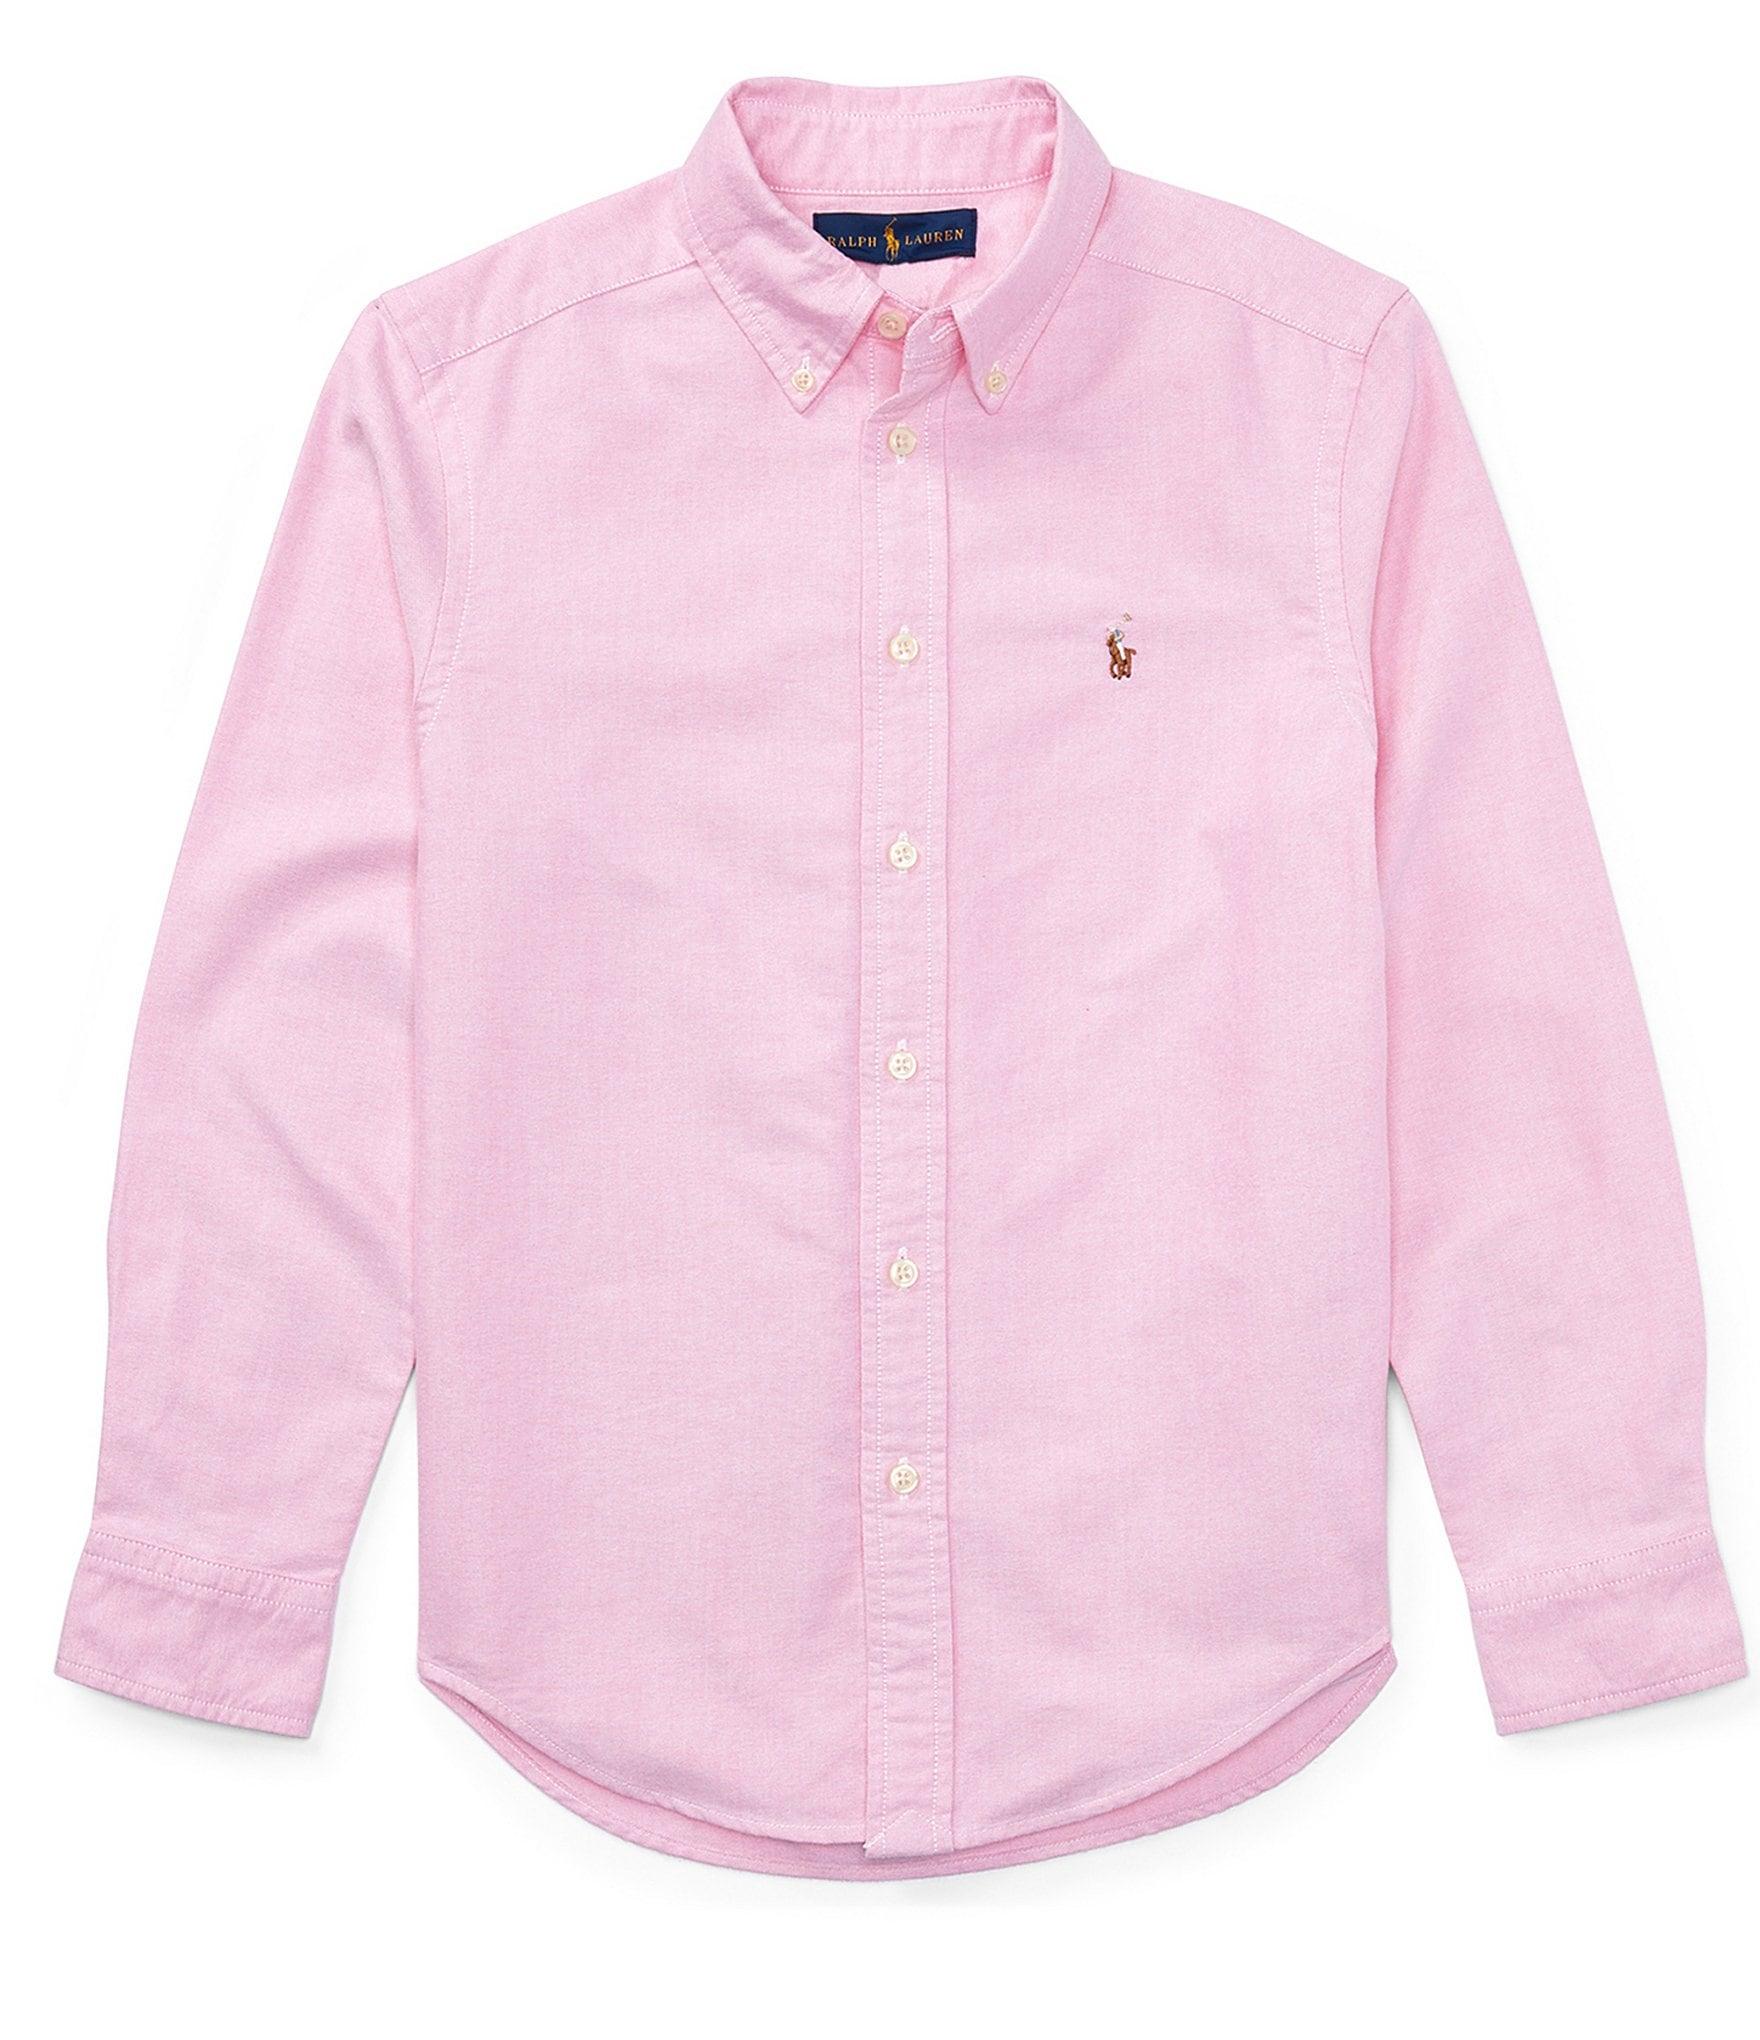 Ralph Lauren Childrenswear Big Boys 8 20 Long Sleeve